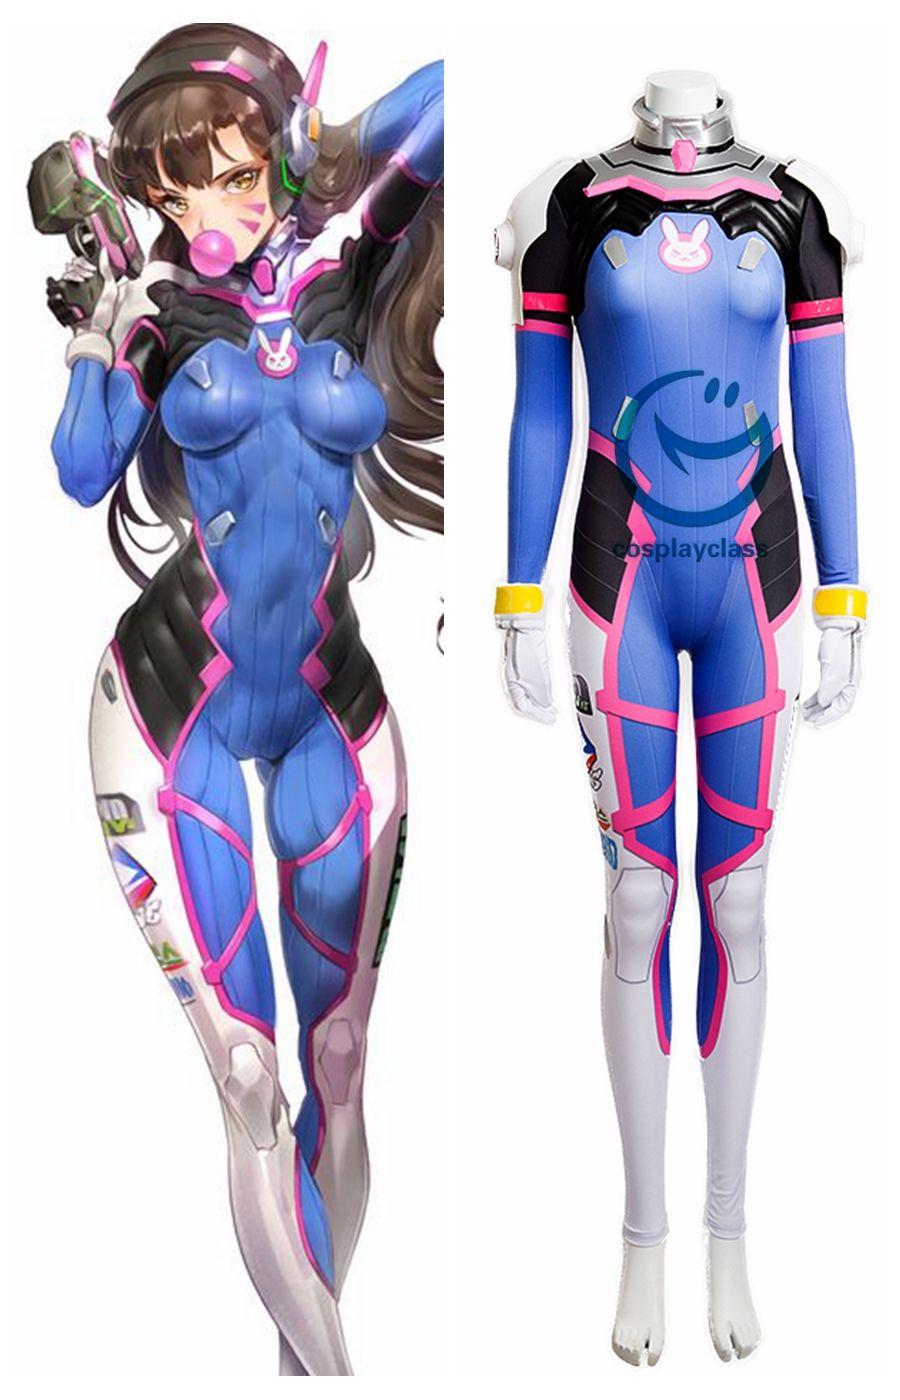 97f44bfc89b88 Overwatch OW D.Va DVa Hana Song Cosplay costume #overwatch #DVA #cosplay # costume #hanasong